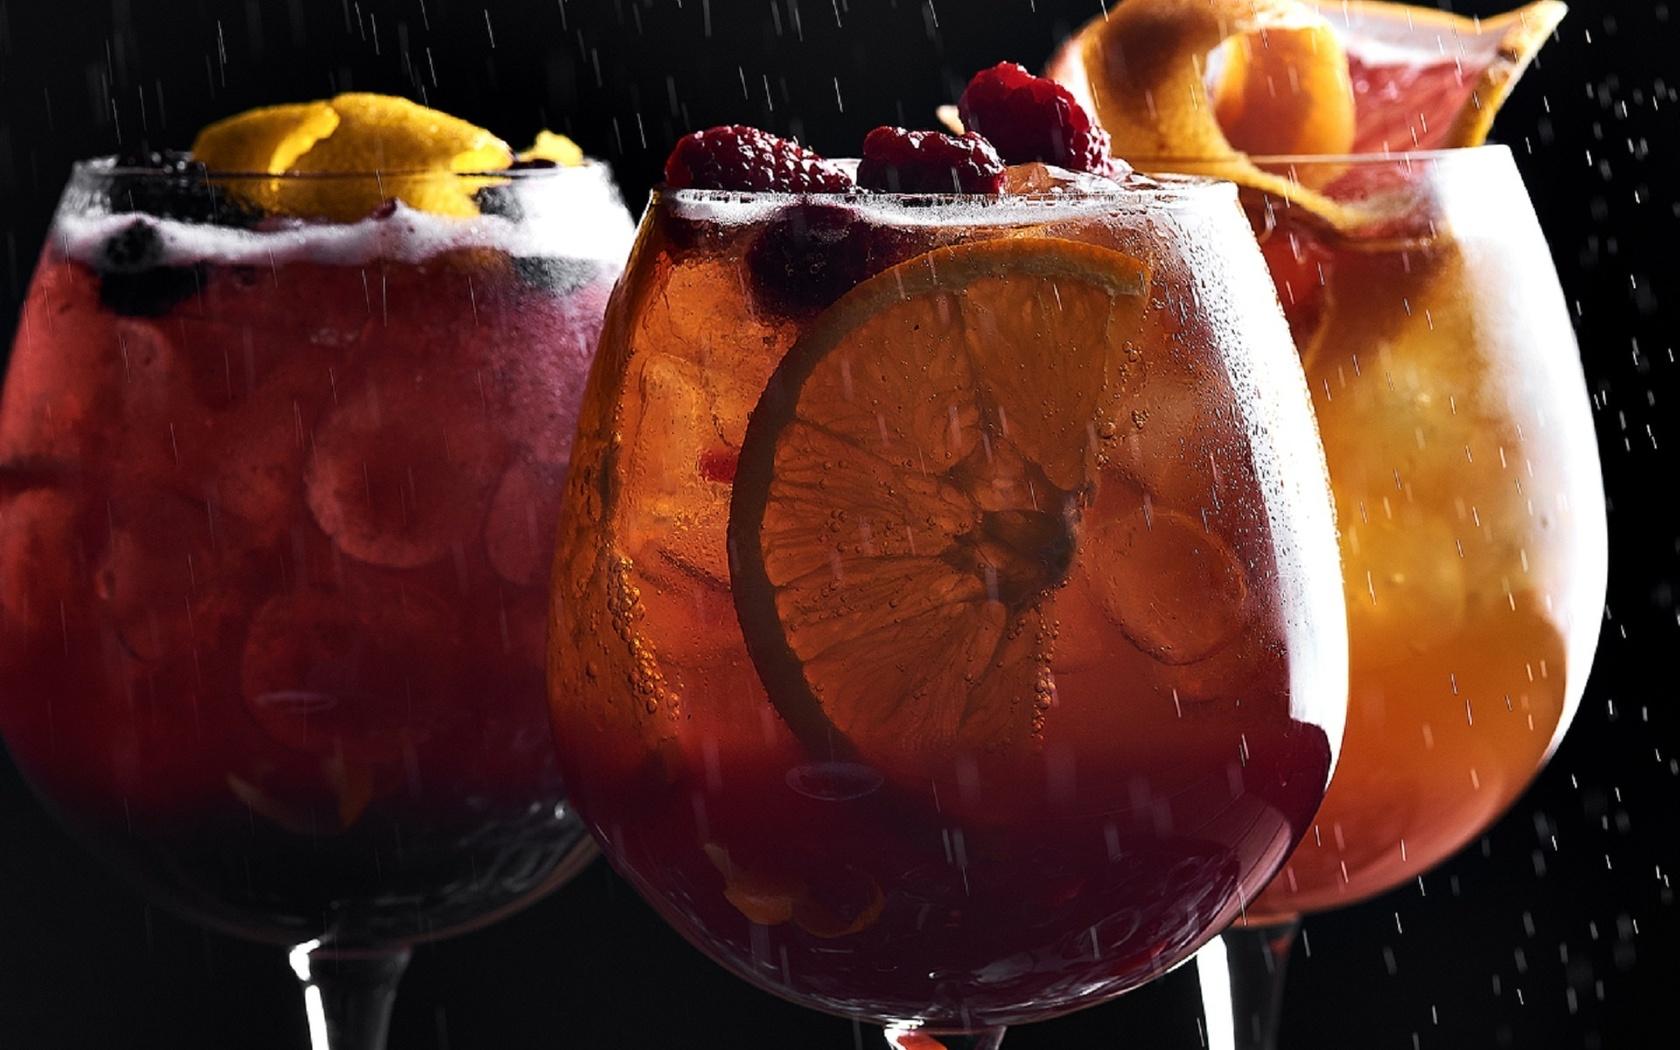 бокалы, коктейль, фрукты, вкусно